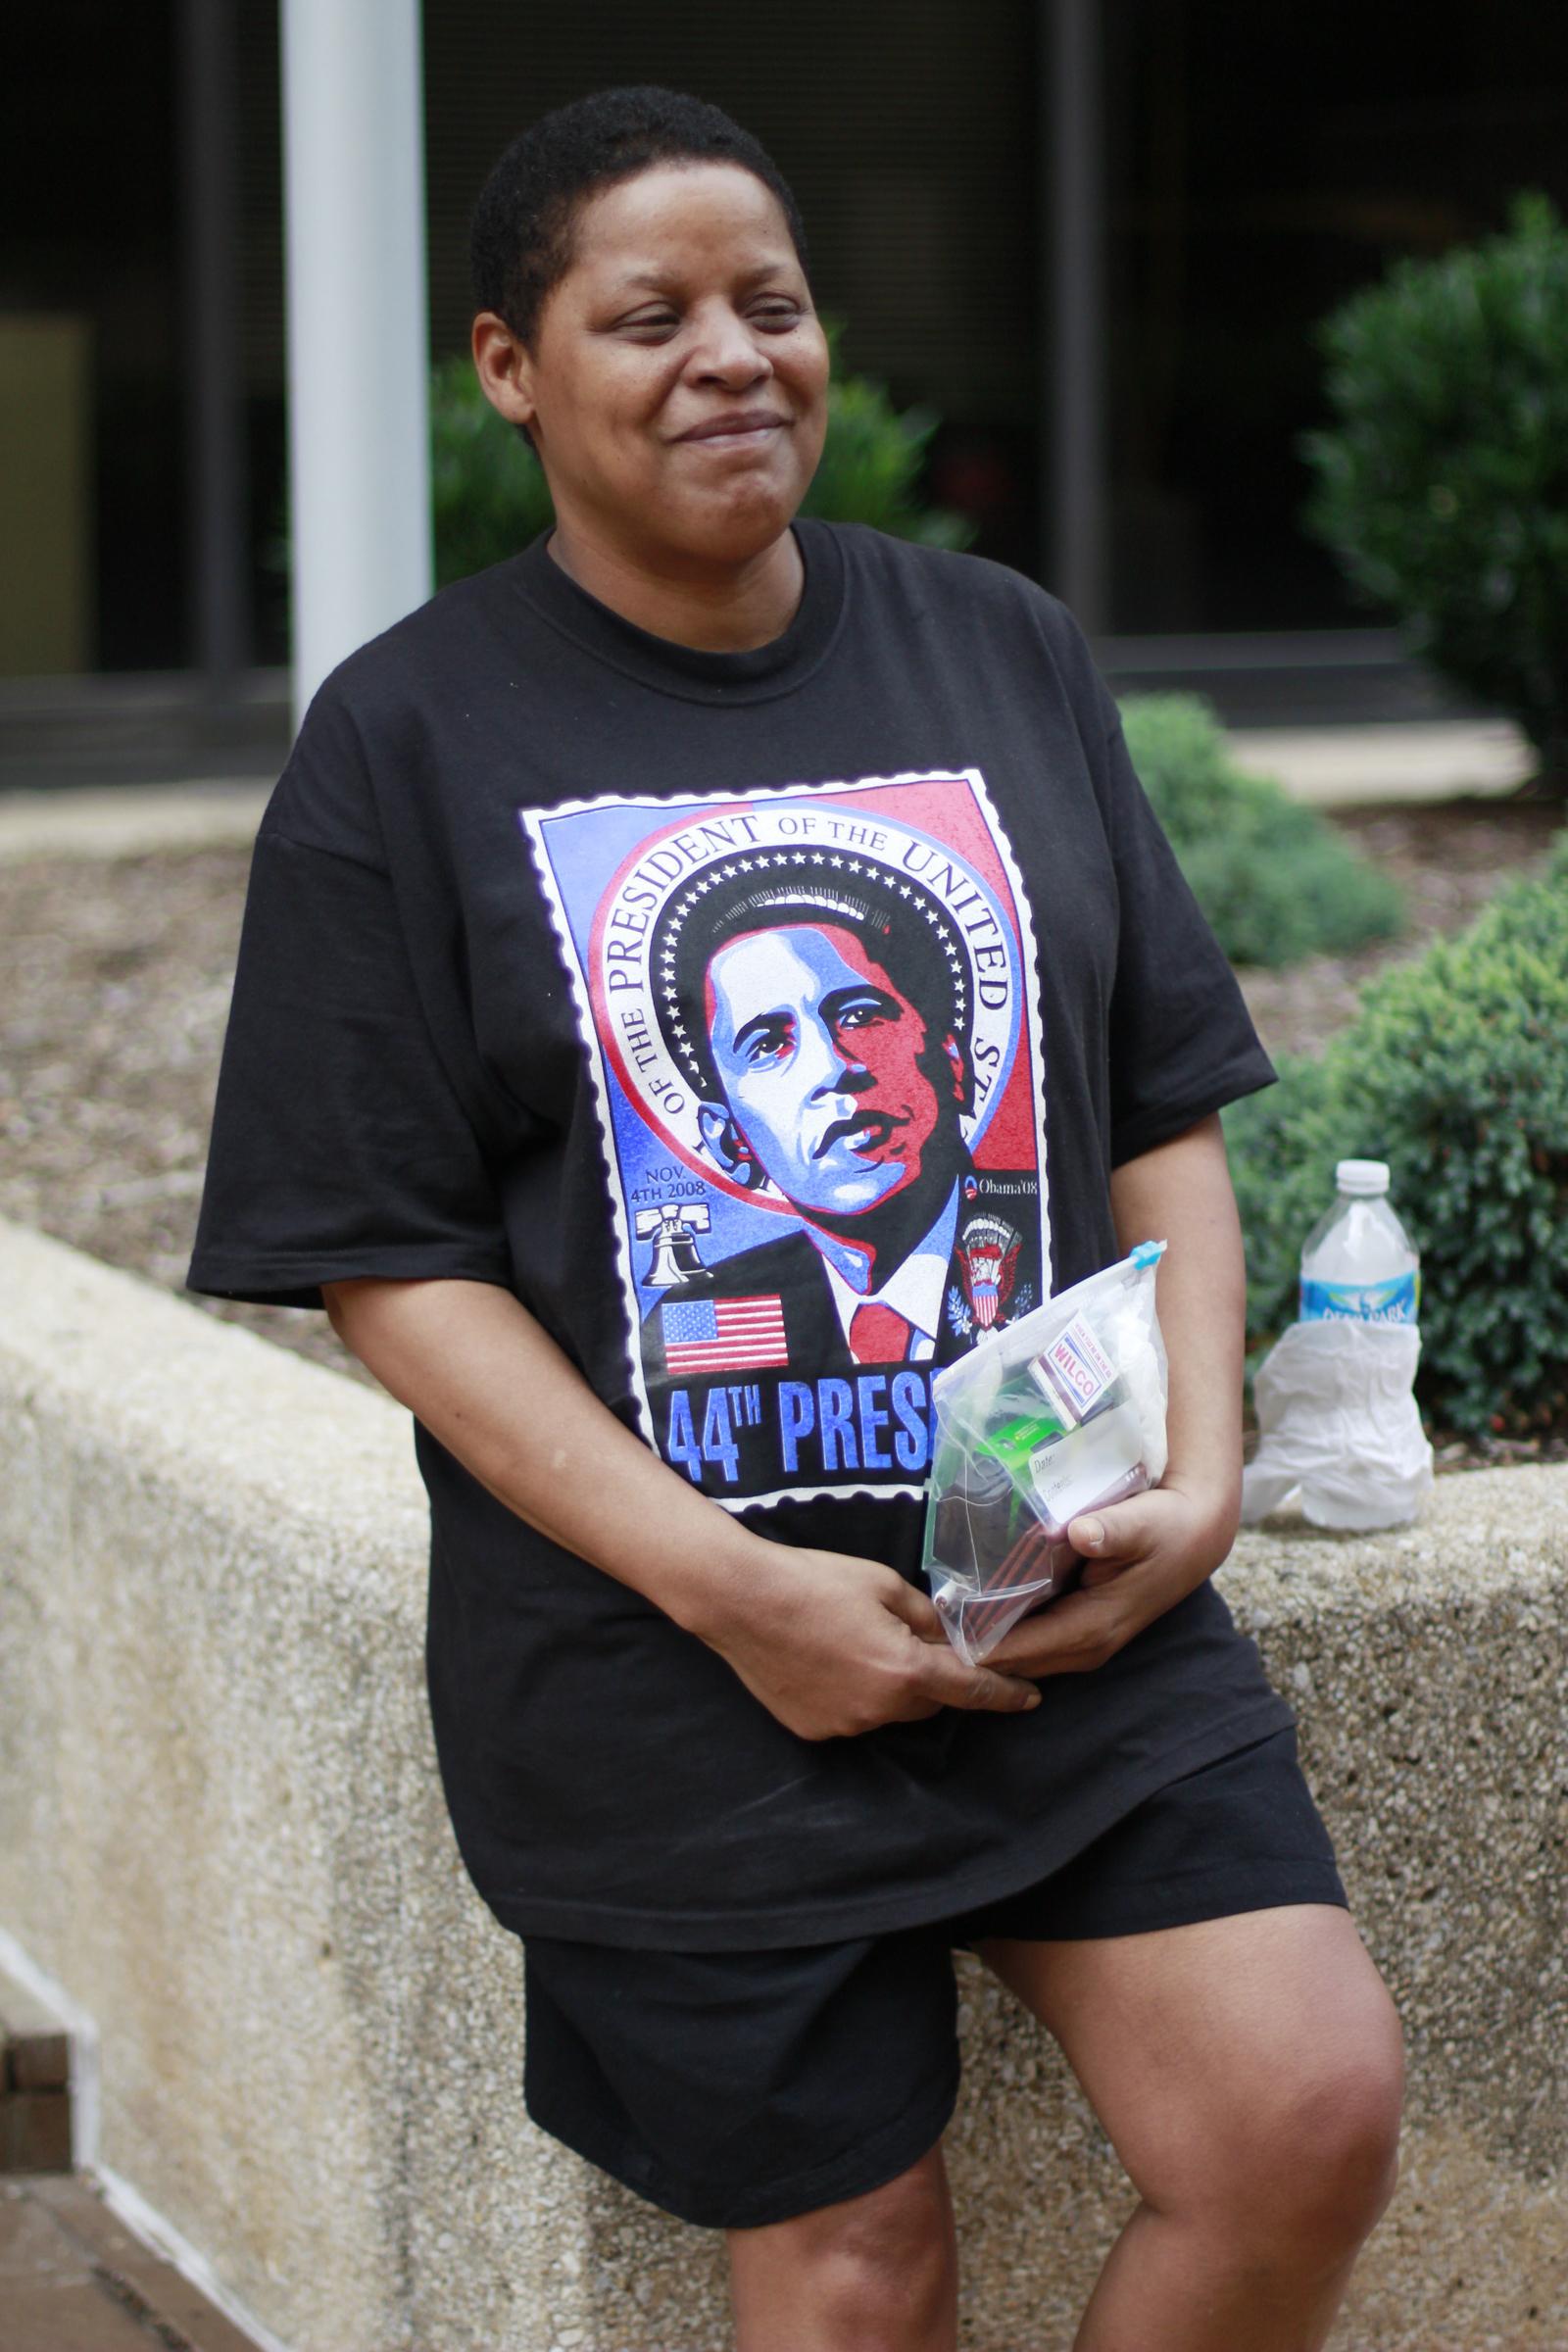 ObamaRoanoke120713_43.jpg